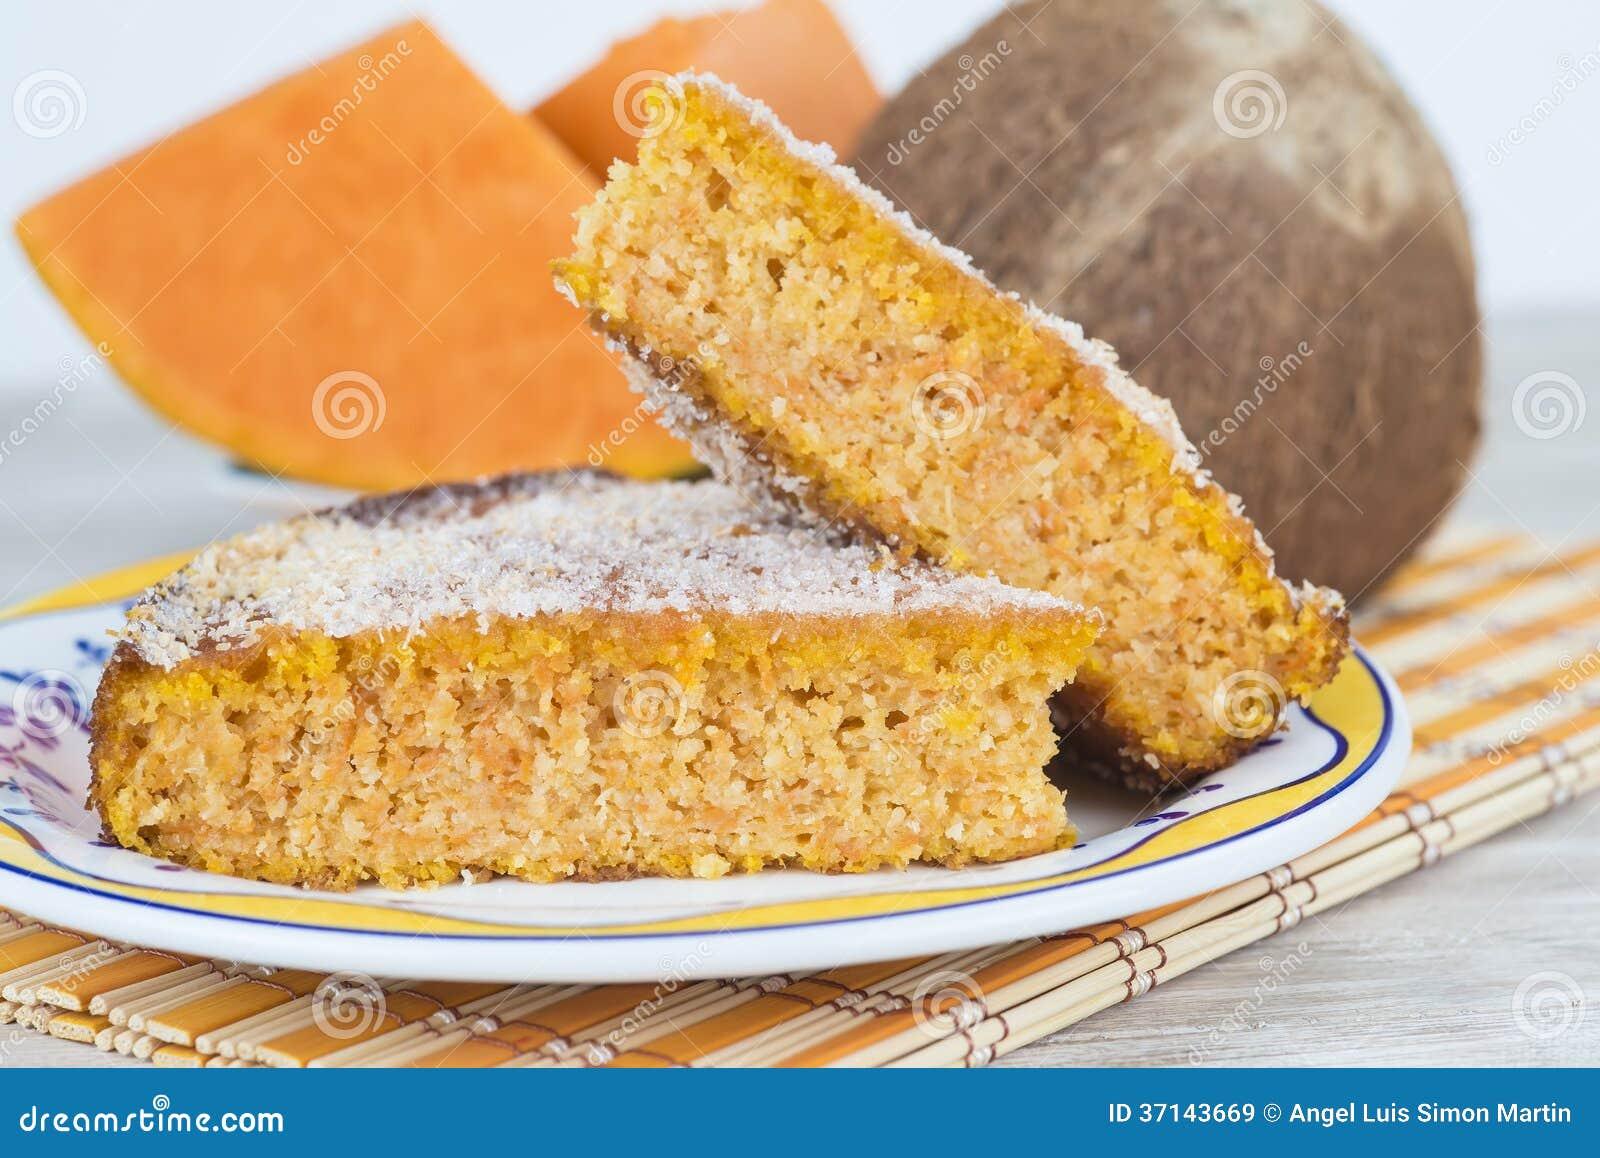 Make Blender Orange Cake